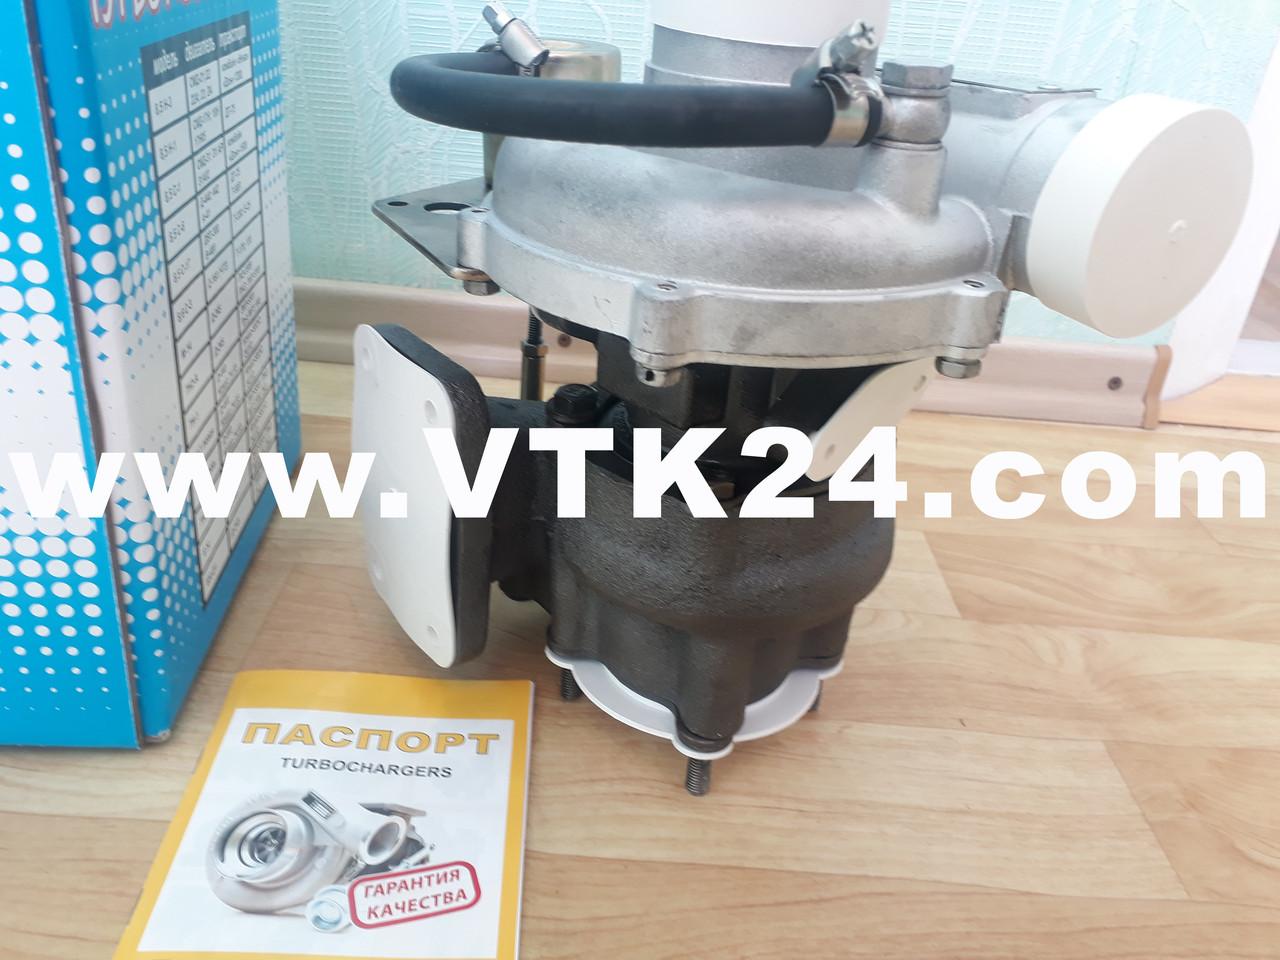 Турбина на Валдай   Турбокомпрессор на ГАЗ 3310    ТКР 6.1